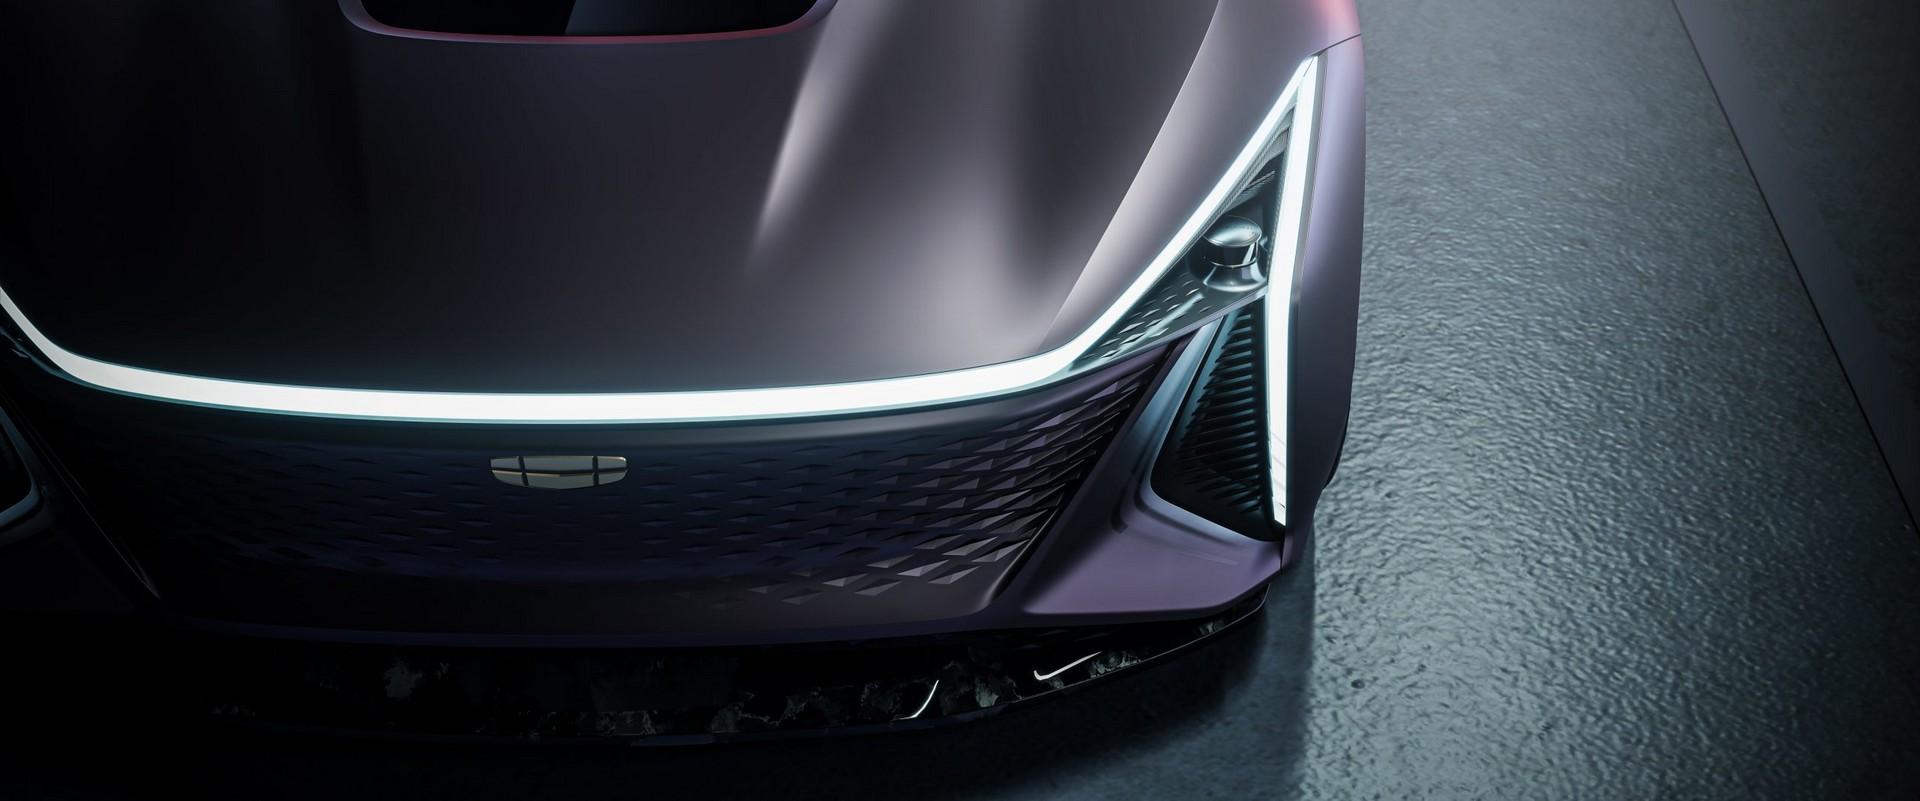 Geely-Vision-Starburst-concept-10